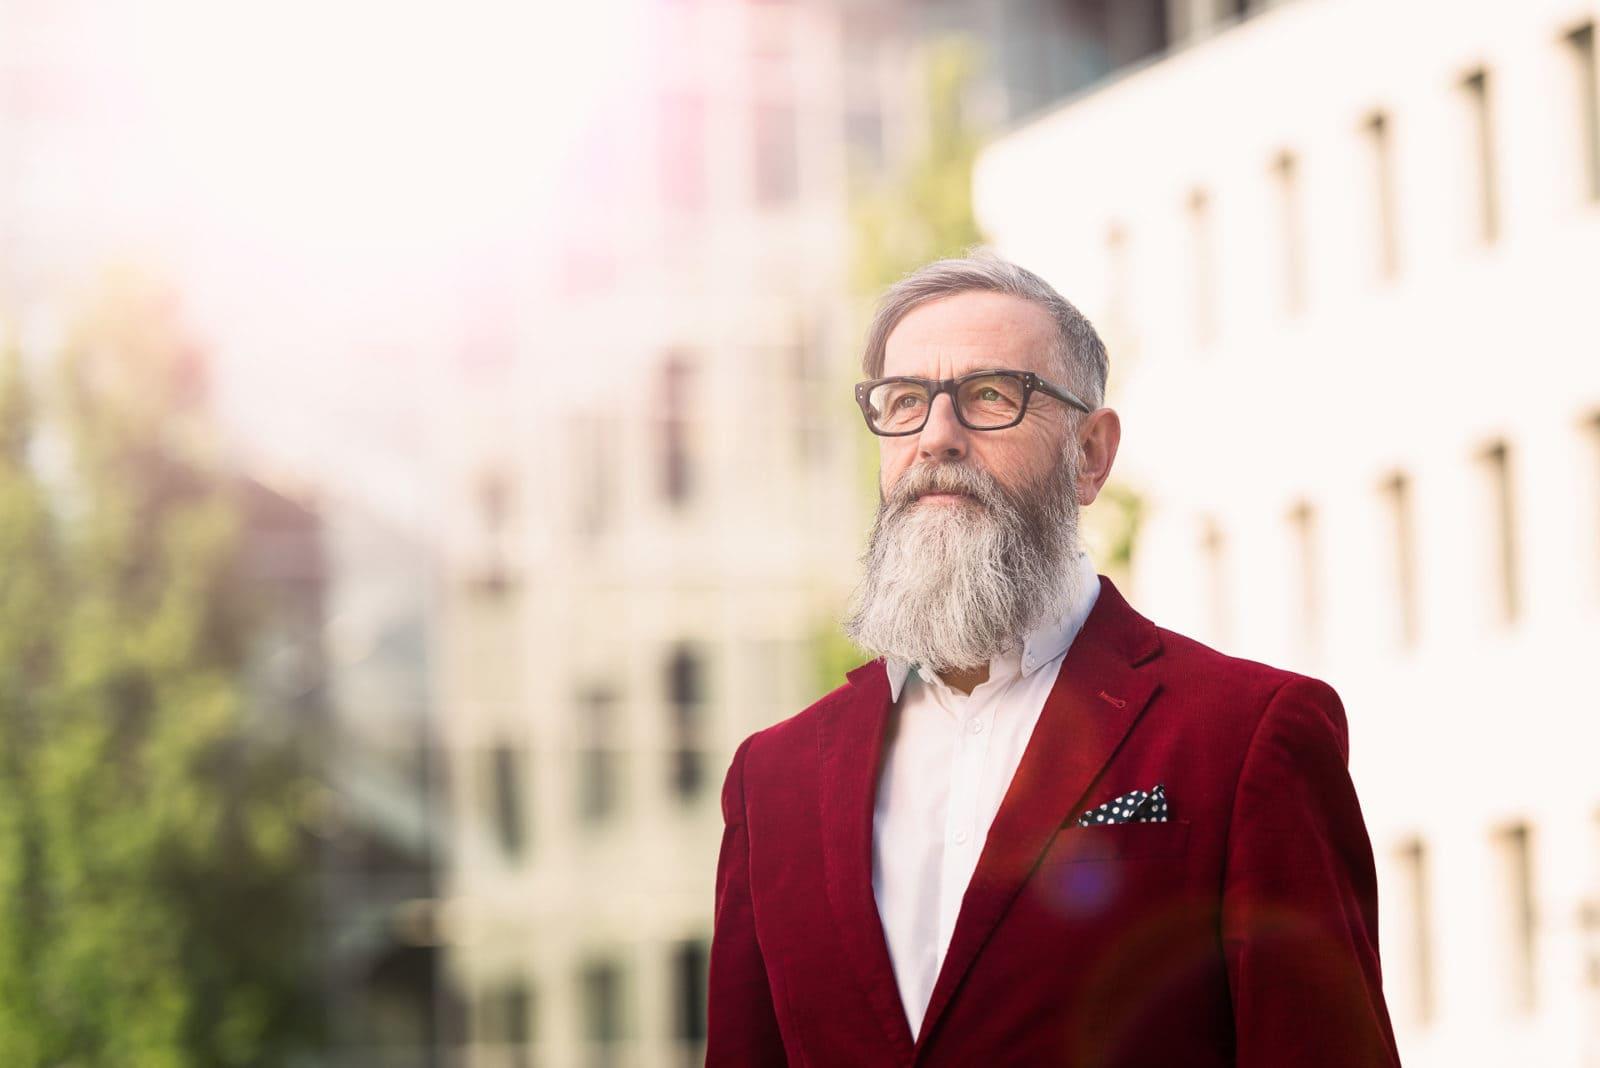 Portrait, Markus Mielek, Fotografie